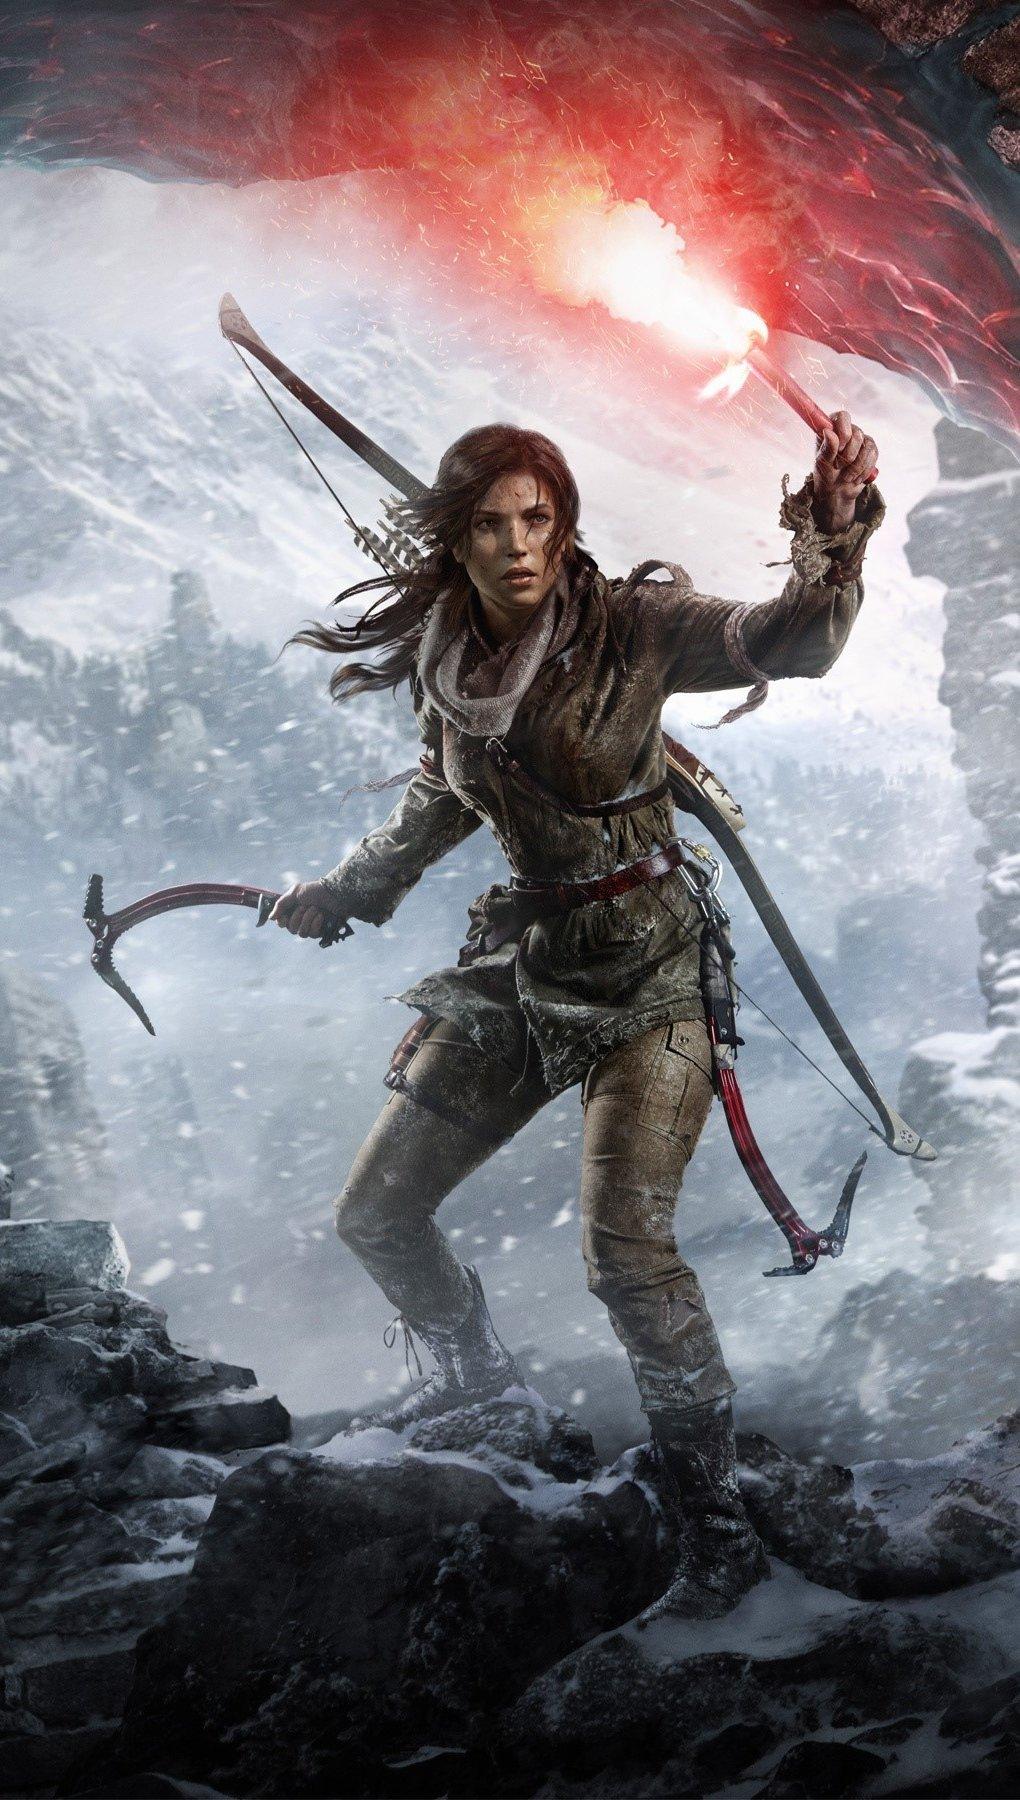 Fondos de pantalla The Rise Of The Tomb Raider Vertical